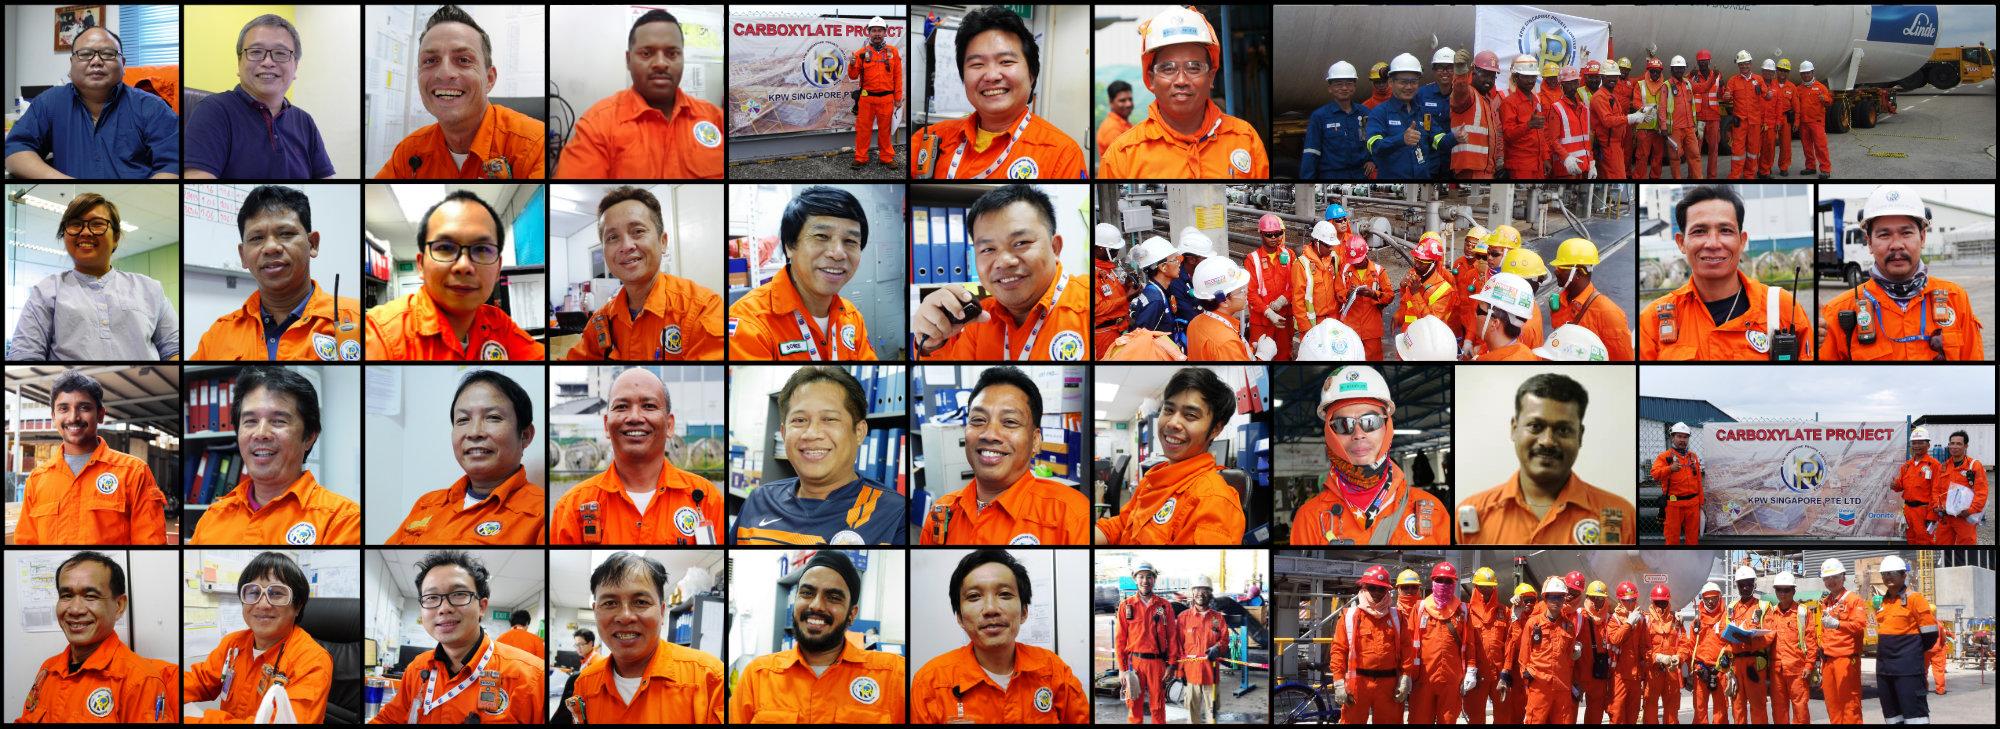 KPW_Staff_Collage_V6